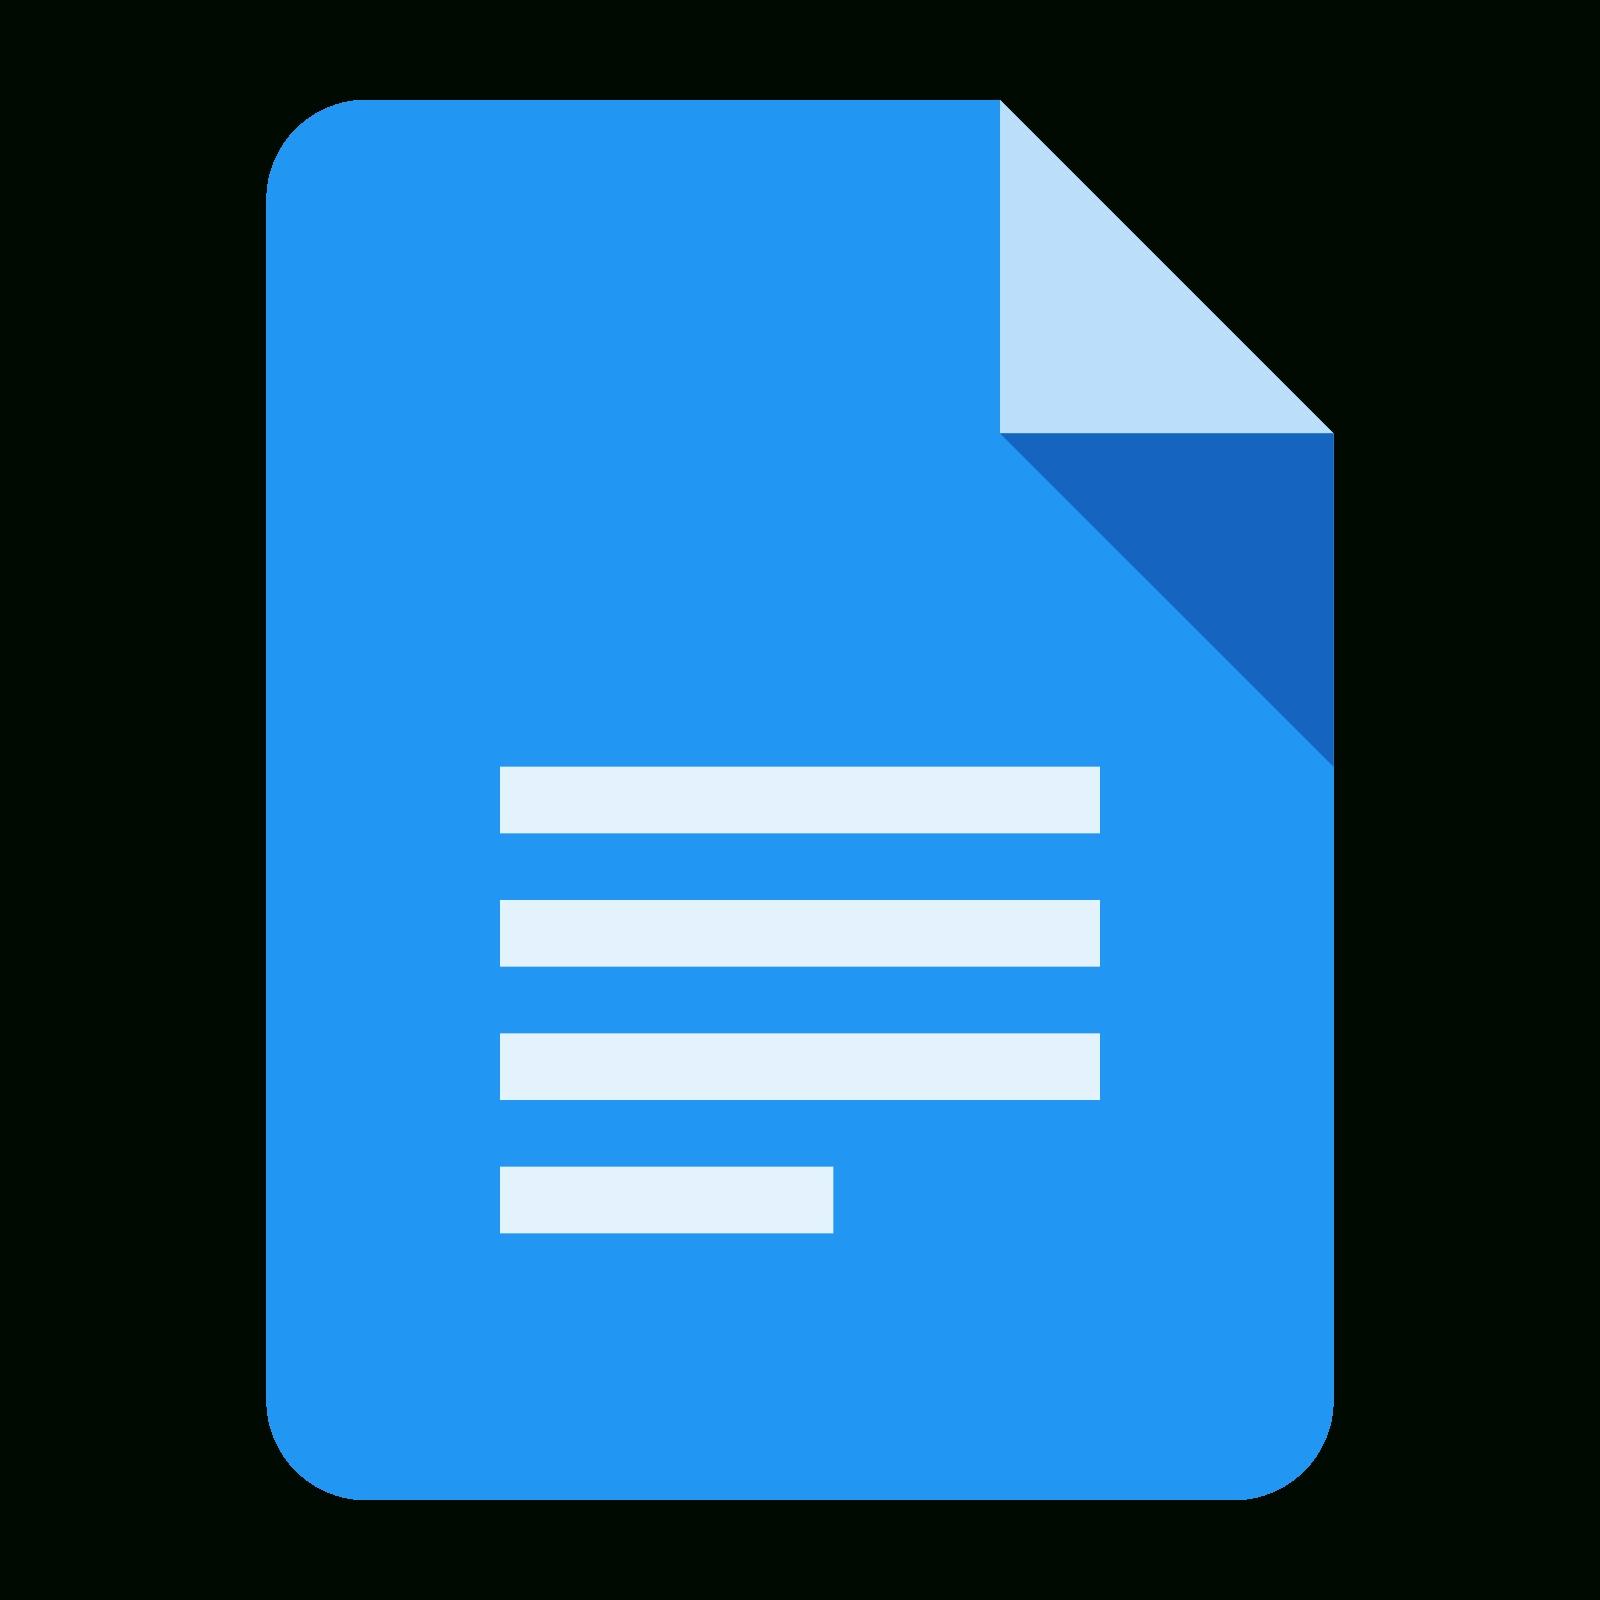 Google Docs Icon Png #90239.